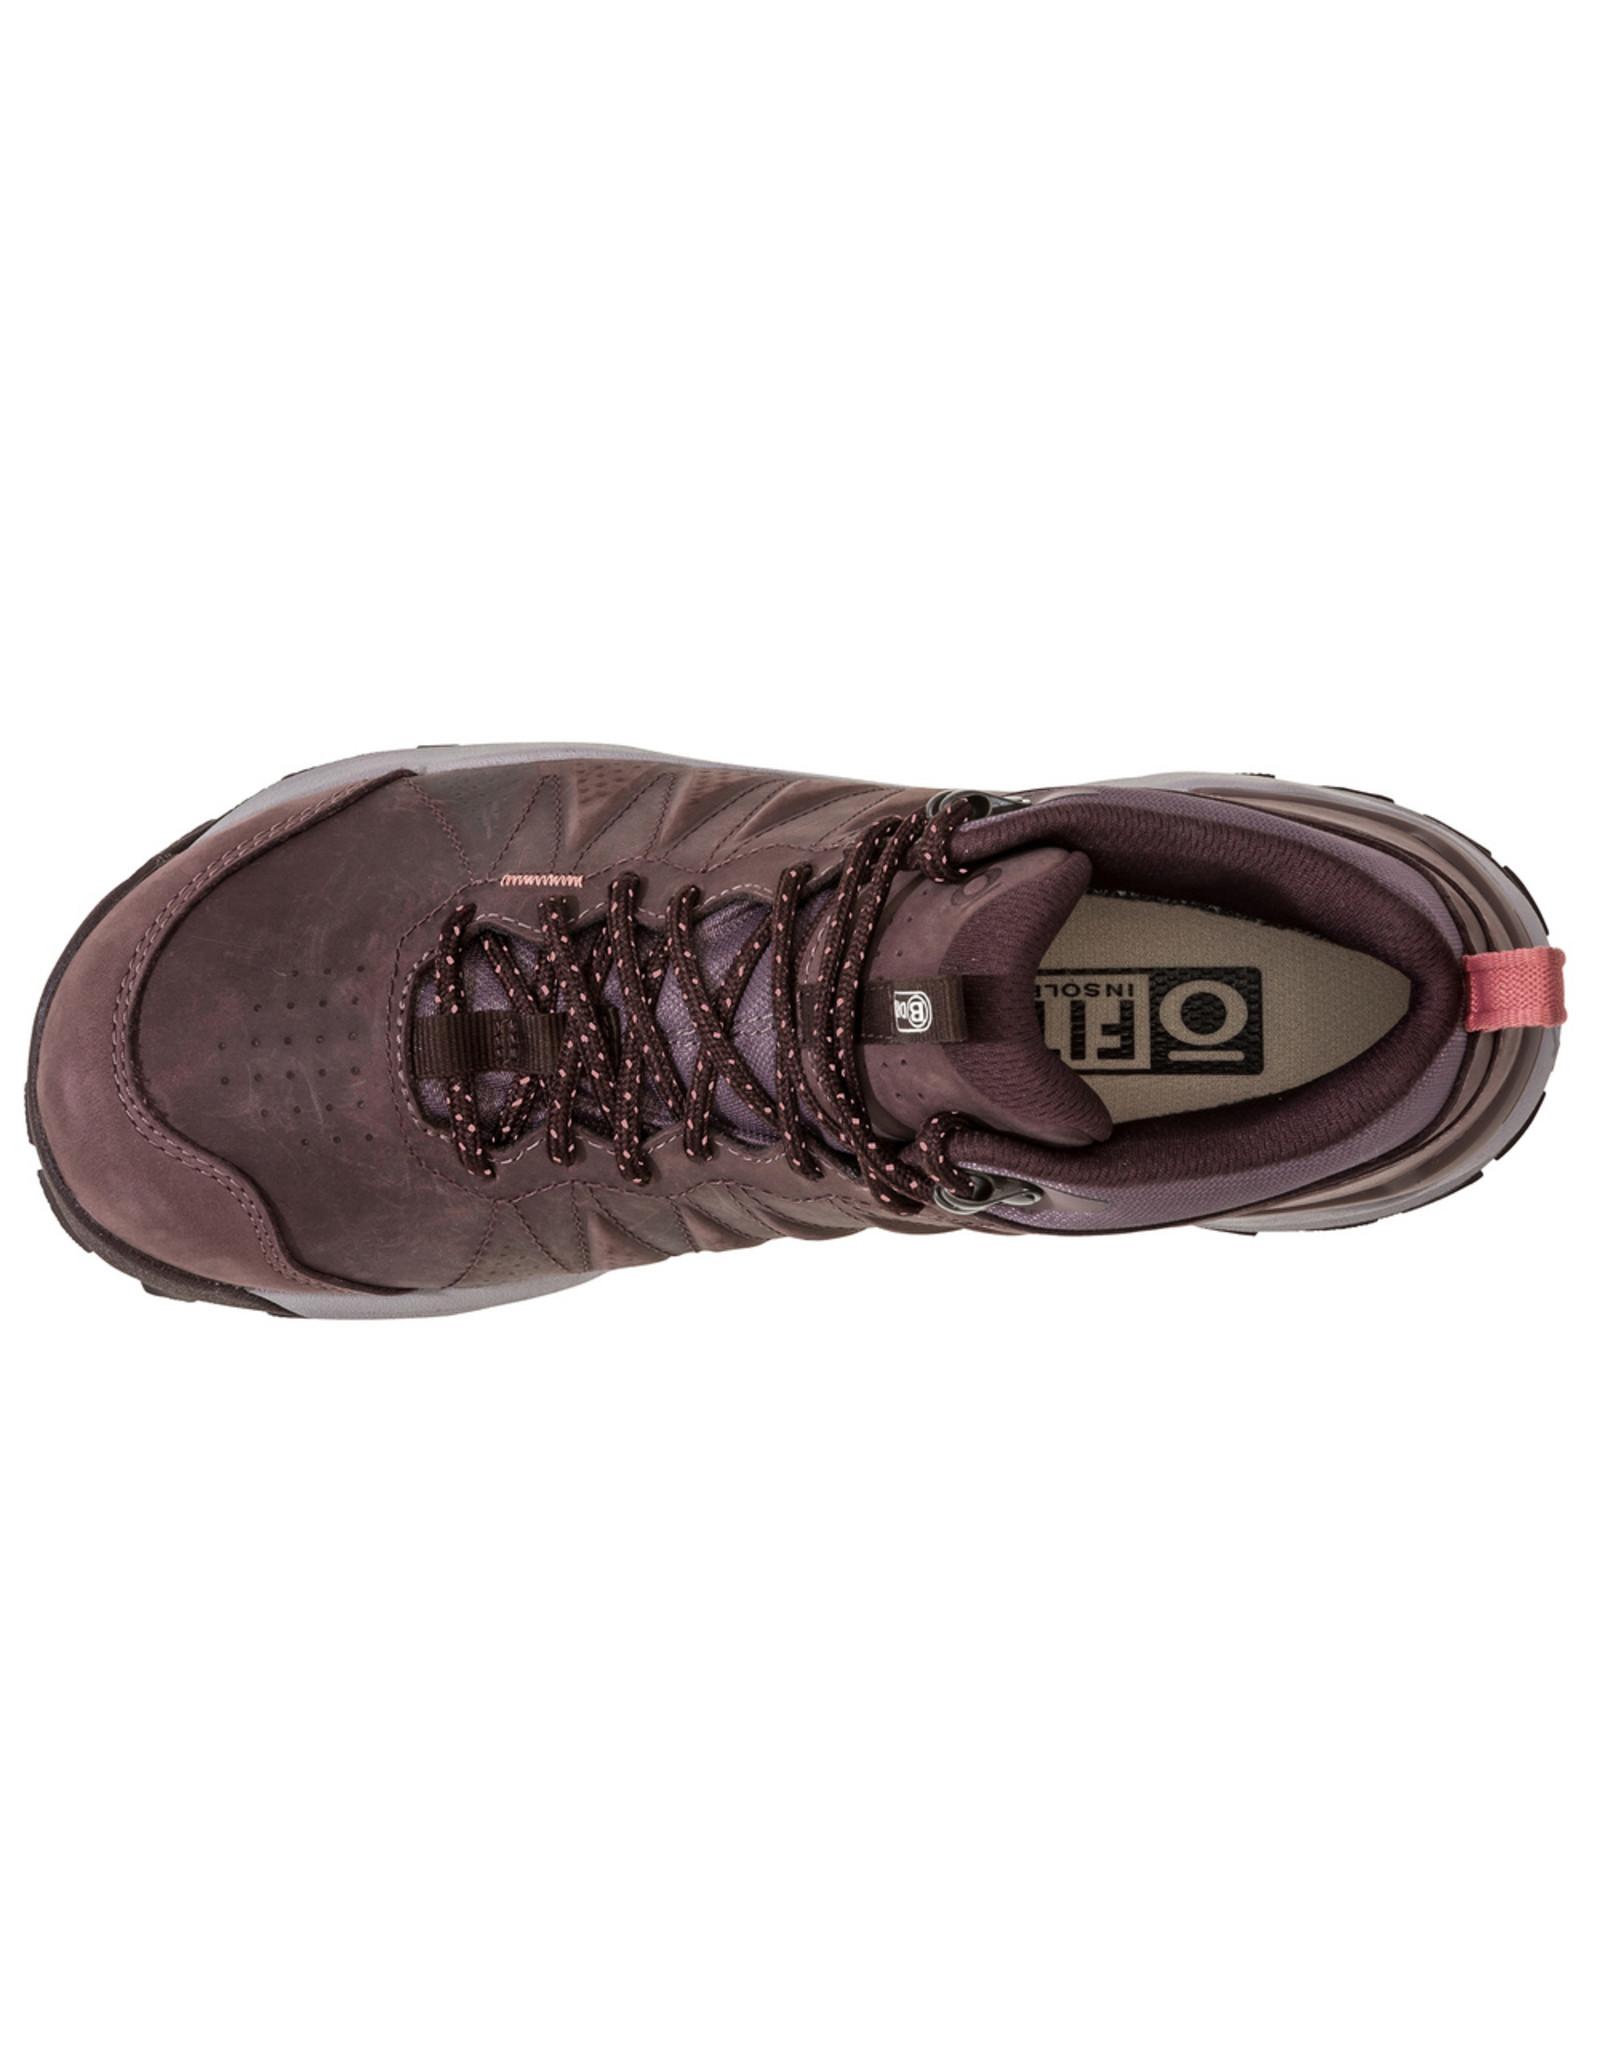 Oboz Footwear Oboz Sypes Mid Leather Waterproof